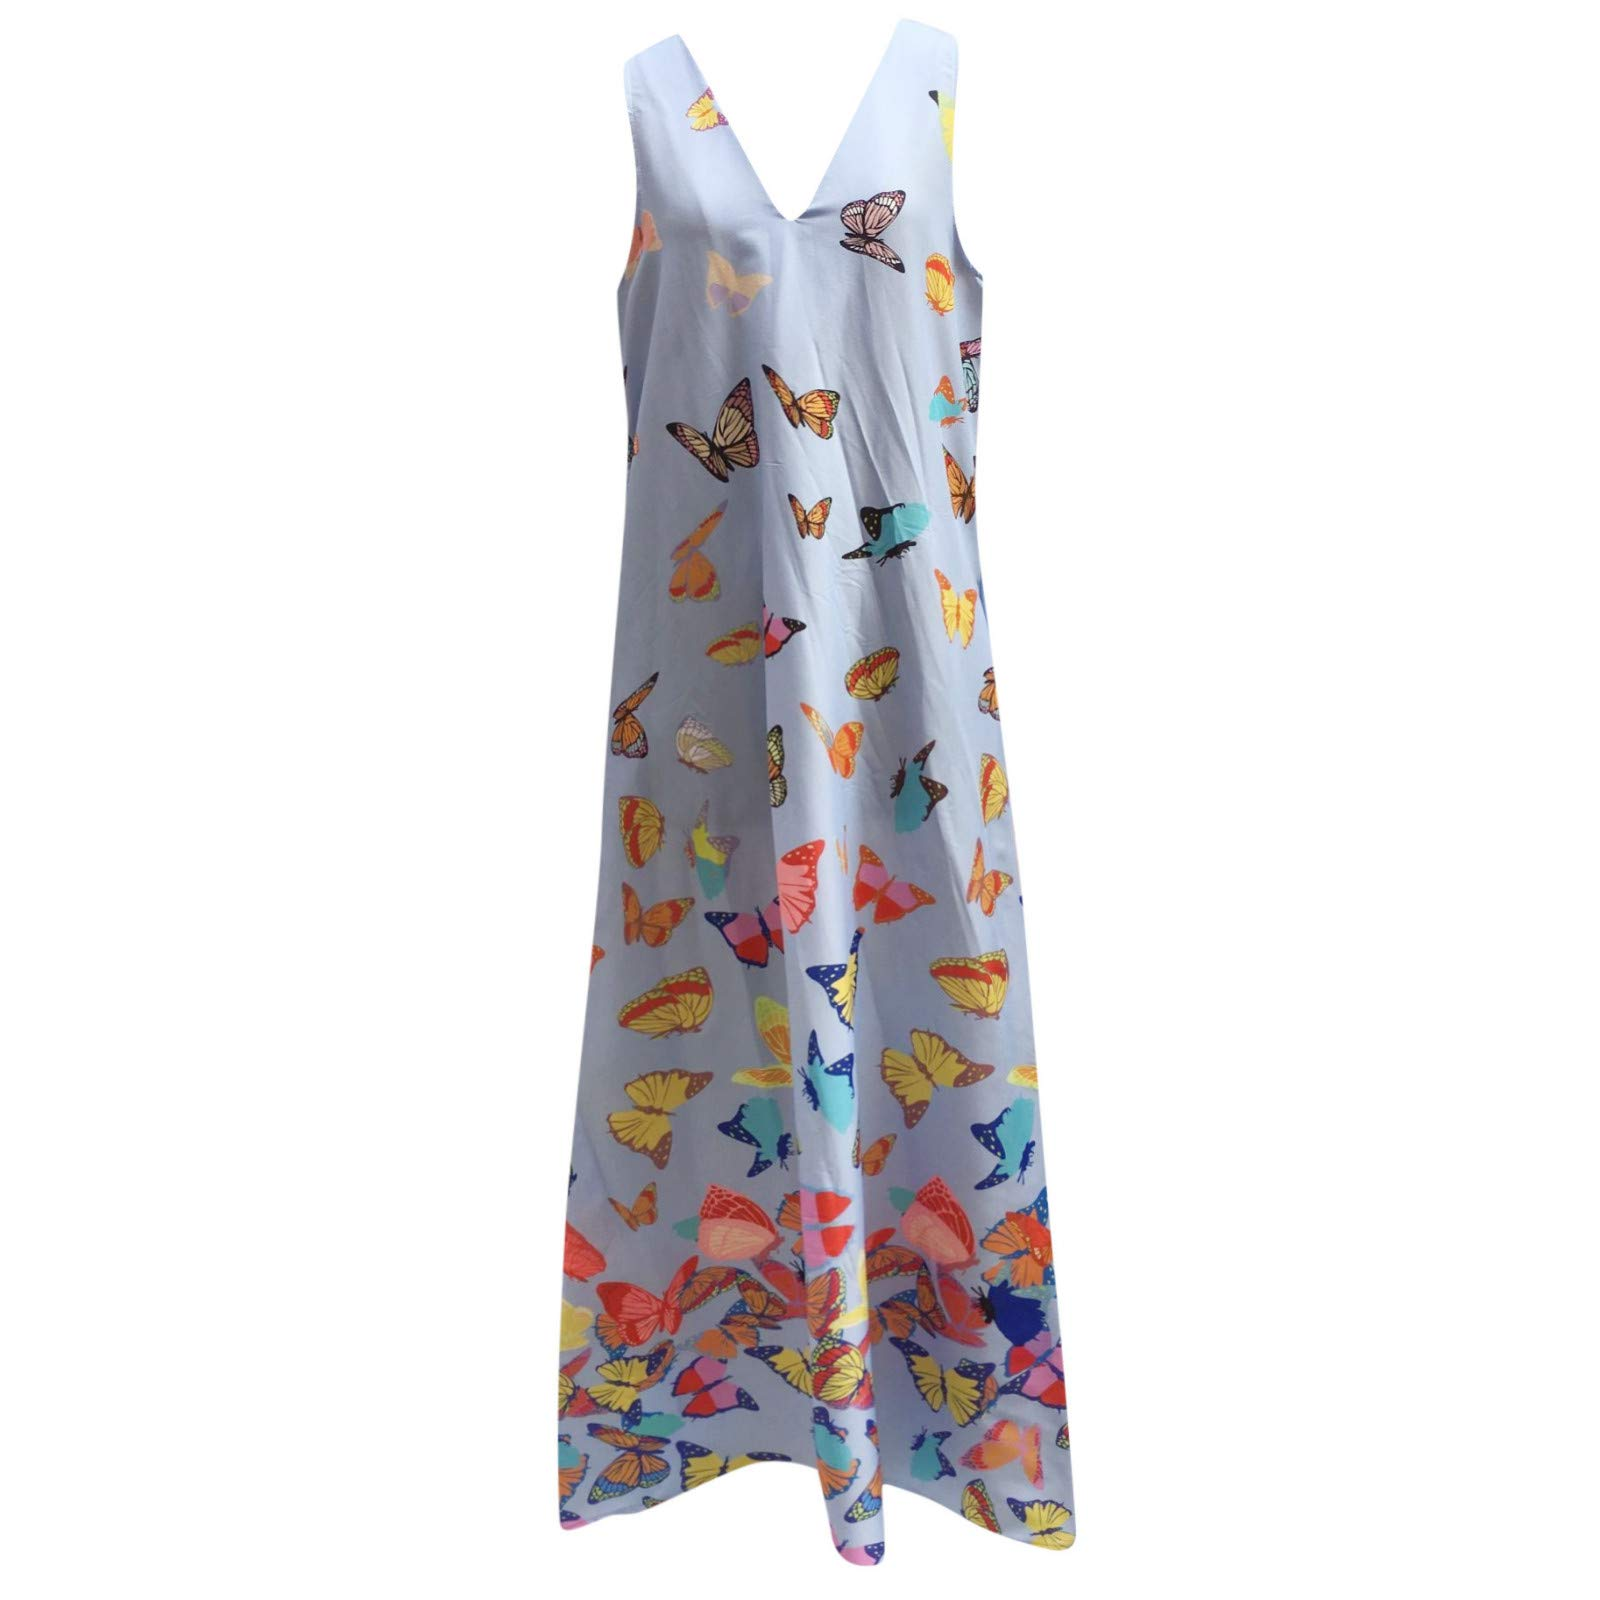 Shusuen Woman Sleeveless Loose Plain Maxi Dresses Casual Long Dresses with Pockets Sexy V Neck Tunics Smock Blue by Shusuen_Clothes (Image #4)